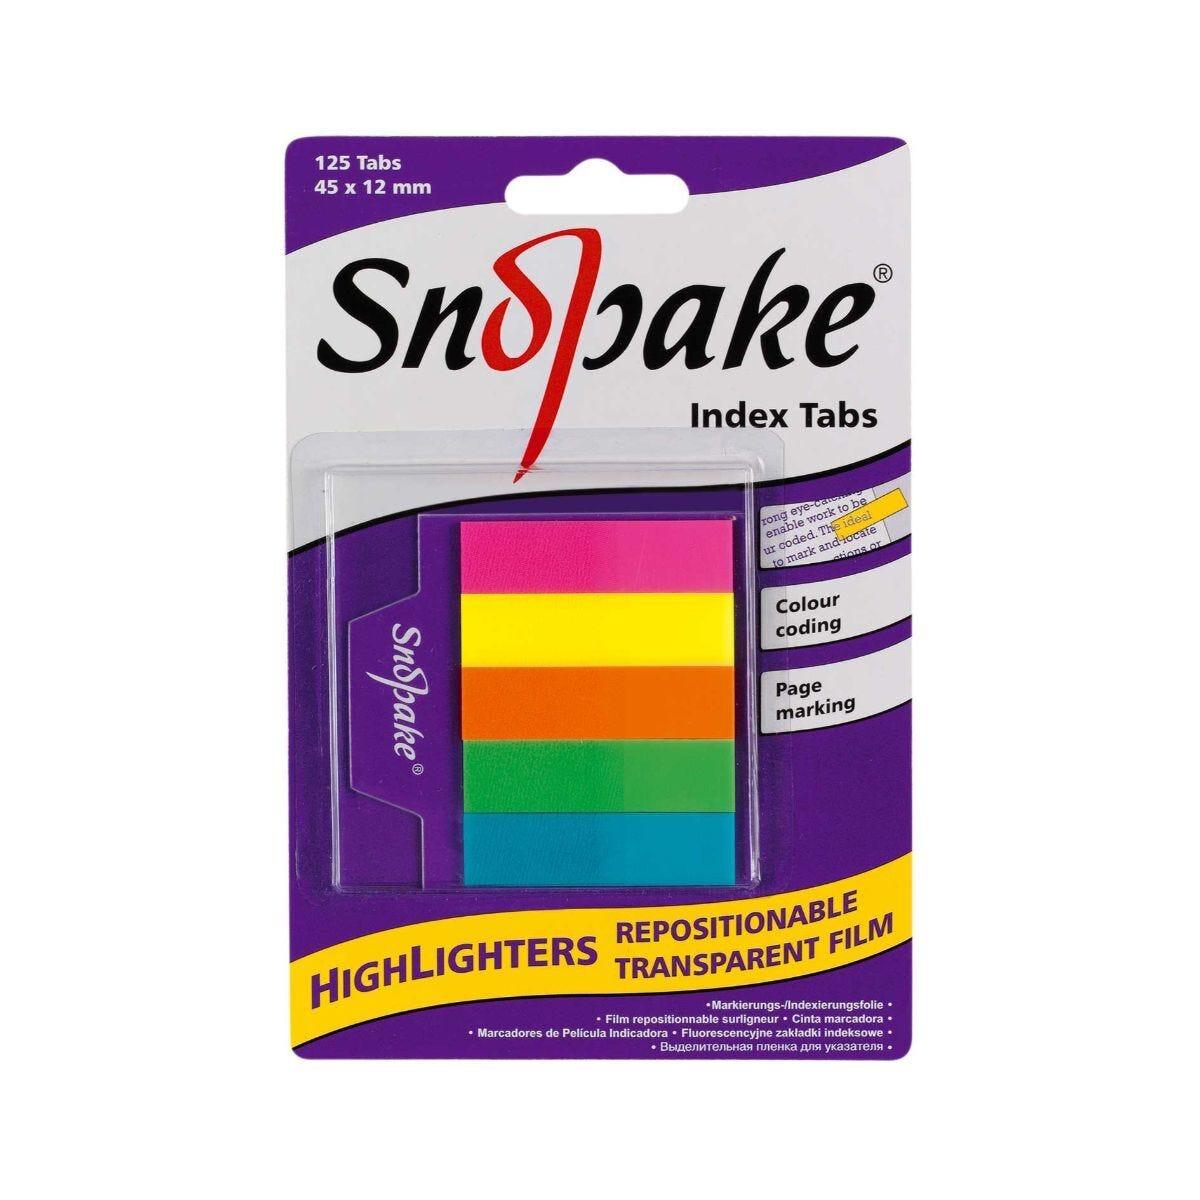 Snopake Tab Highlighters 45x12mm 125 Sheets